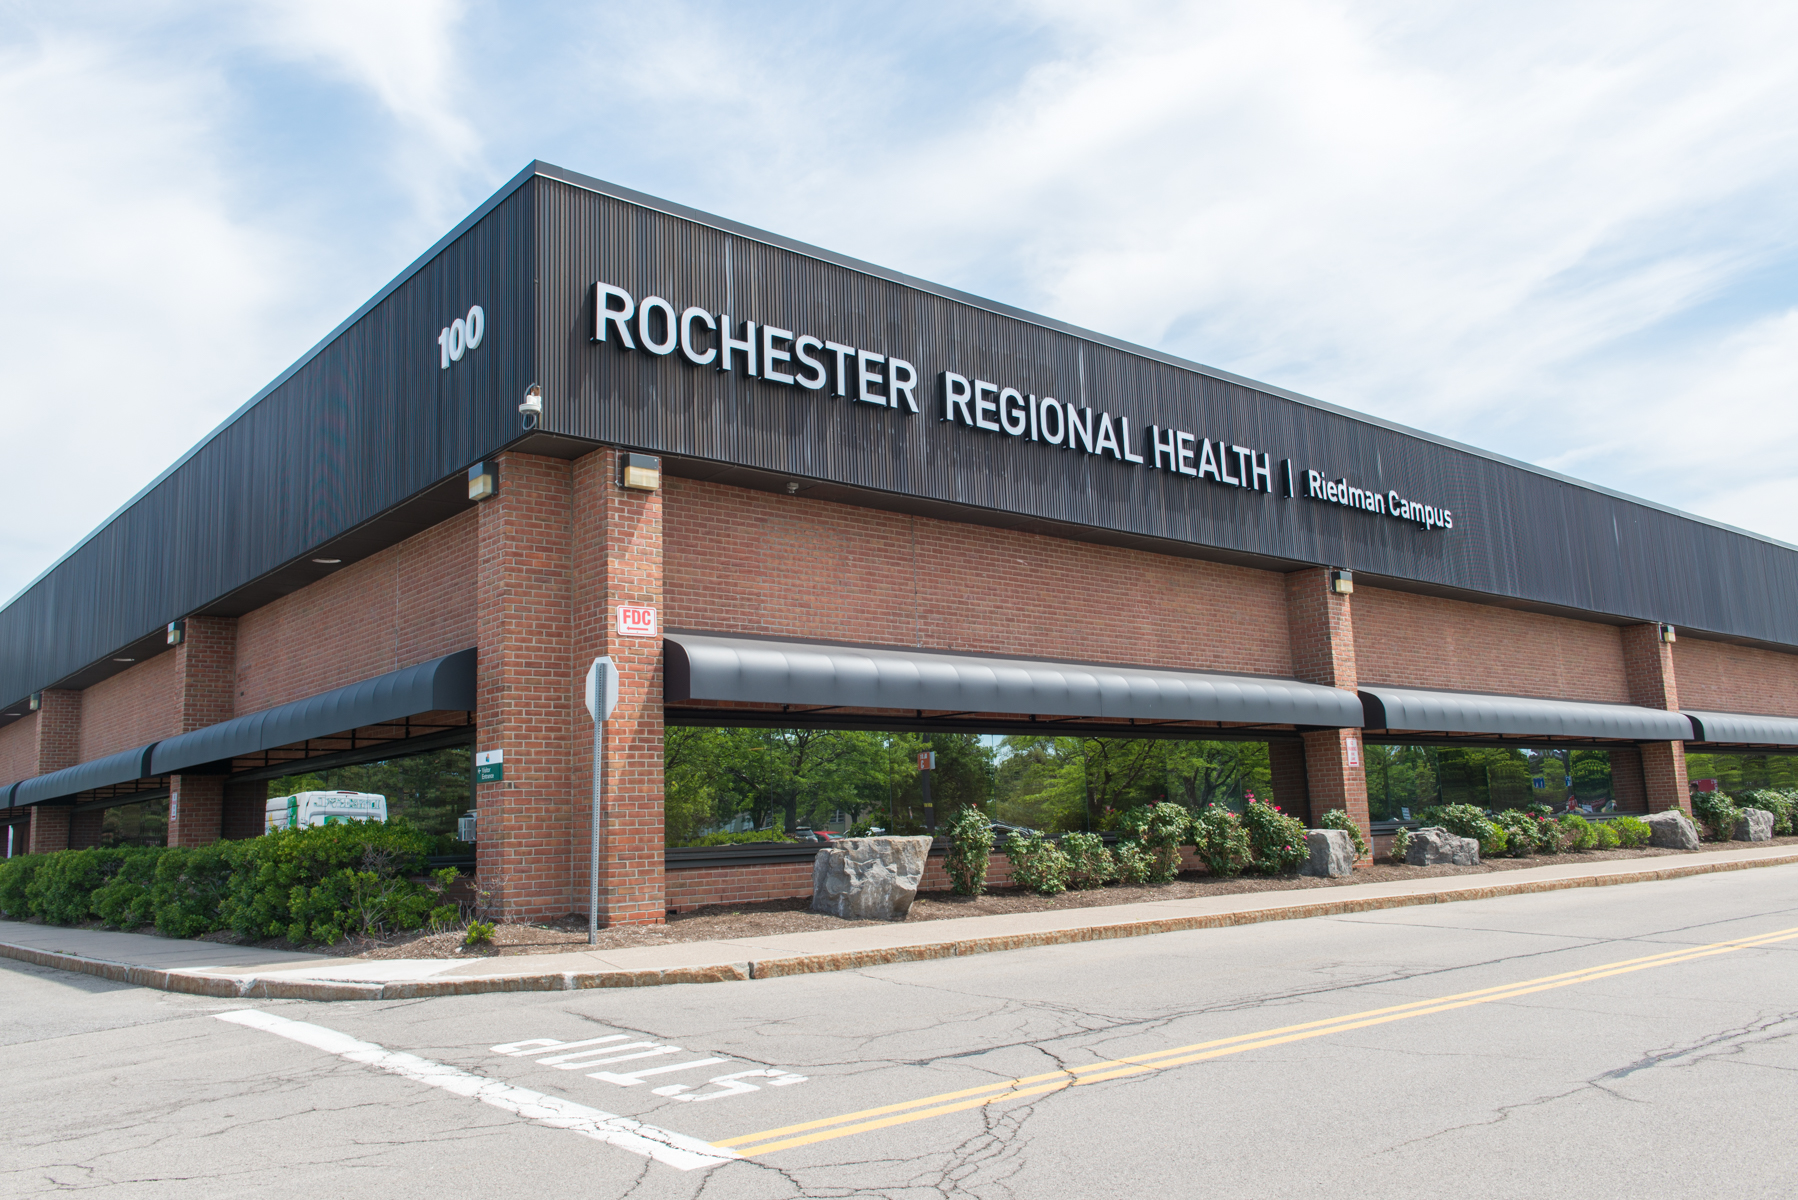 Rochester Regional Health - Wikipedia